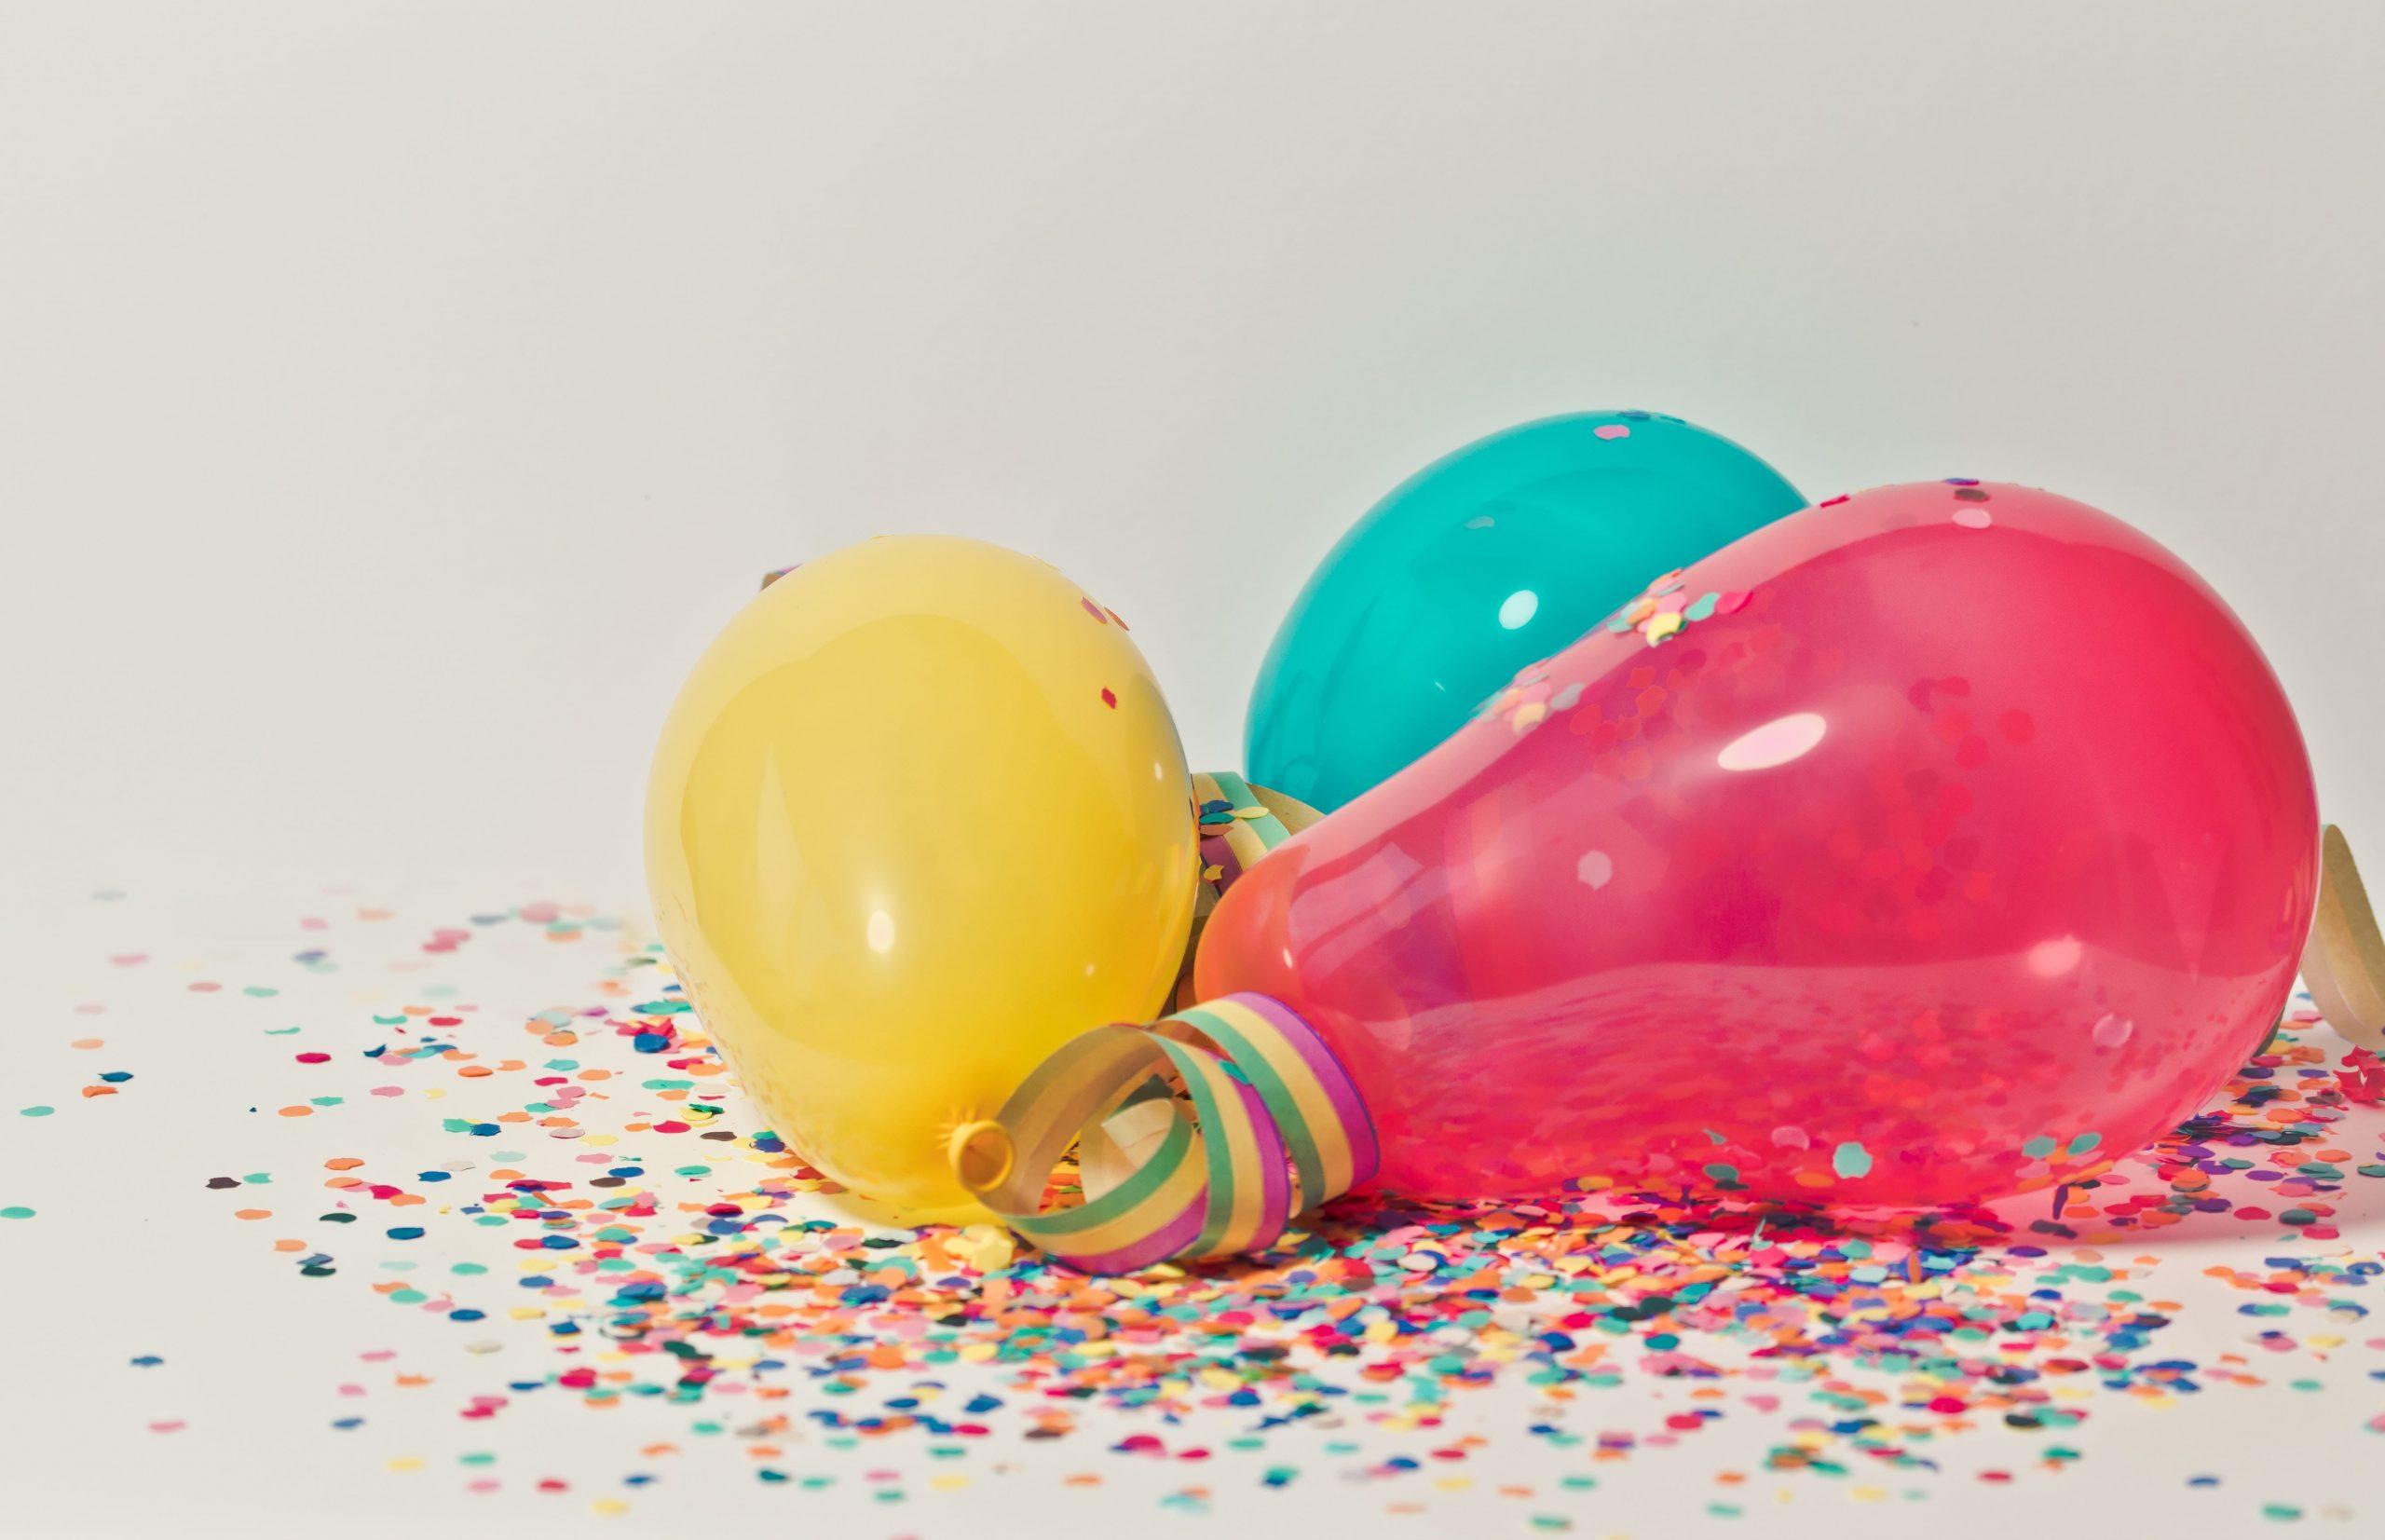 30th Birthday Surprise Ideas She Ll Love Sedgebrook Hall